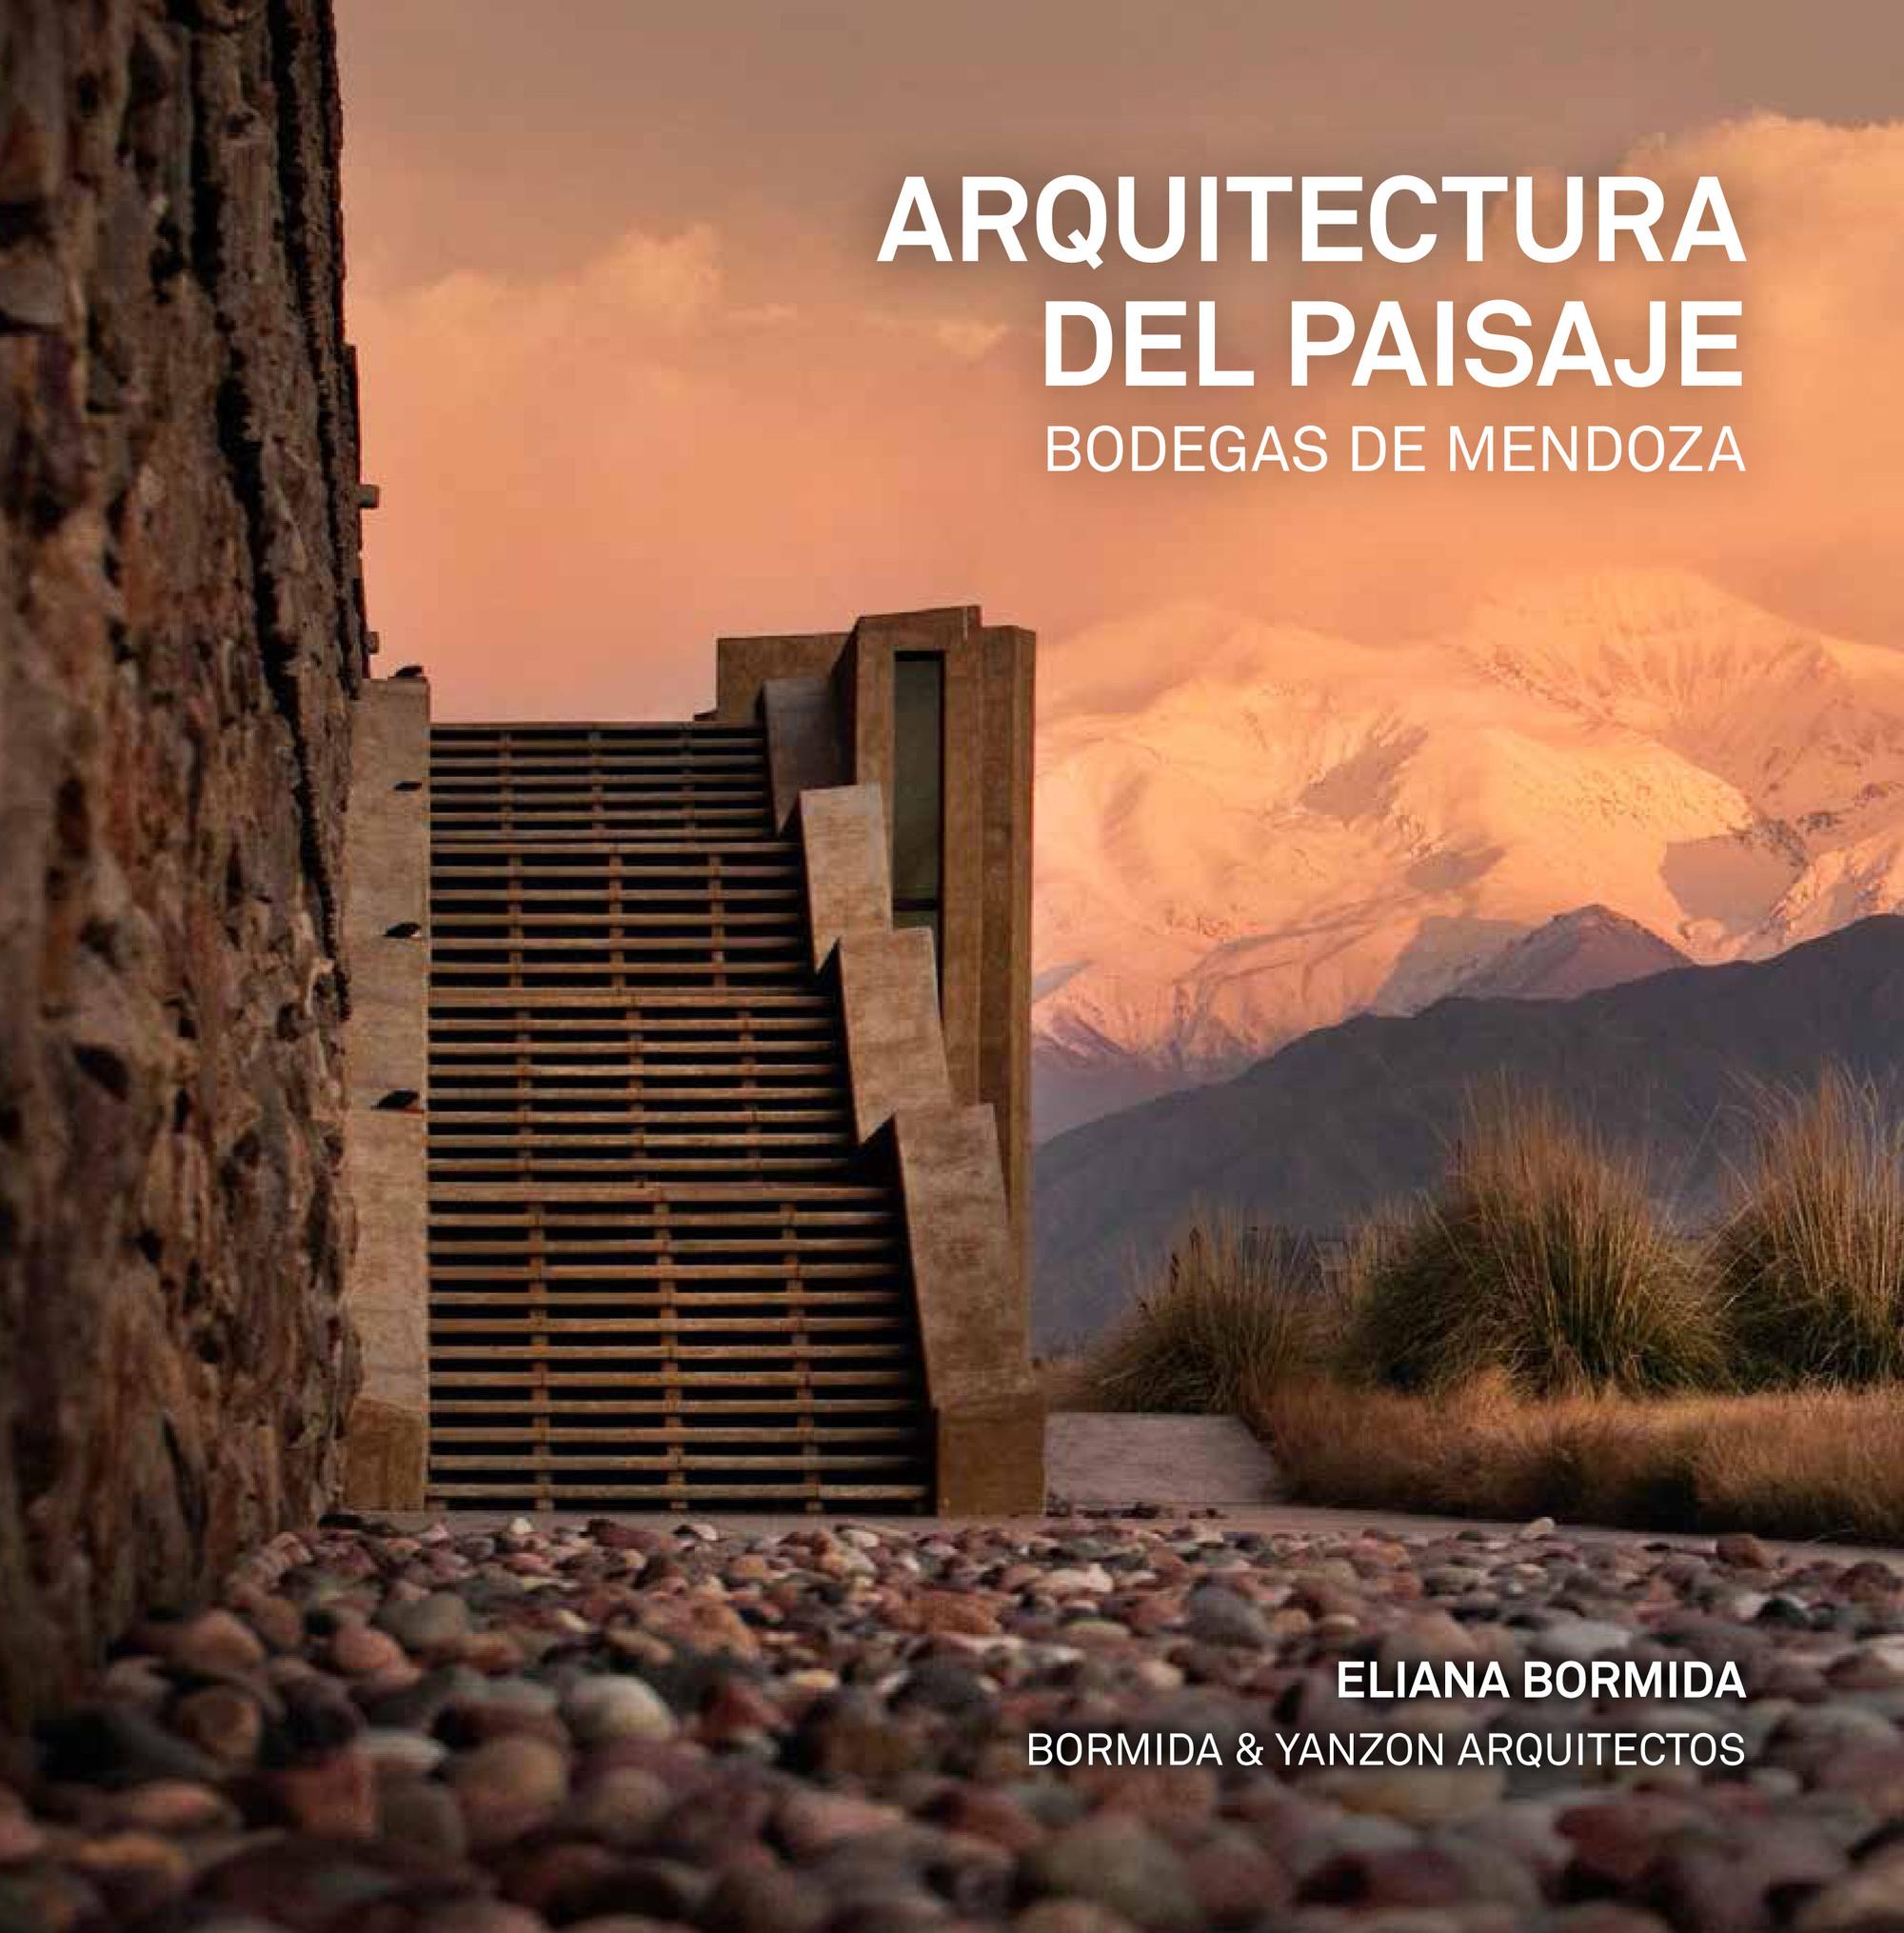 Arquitectura del paisaje bodegas de mendoza eliana for Arquitectura del paisaje